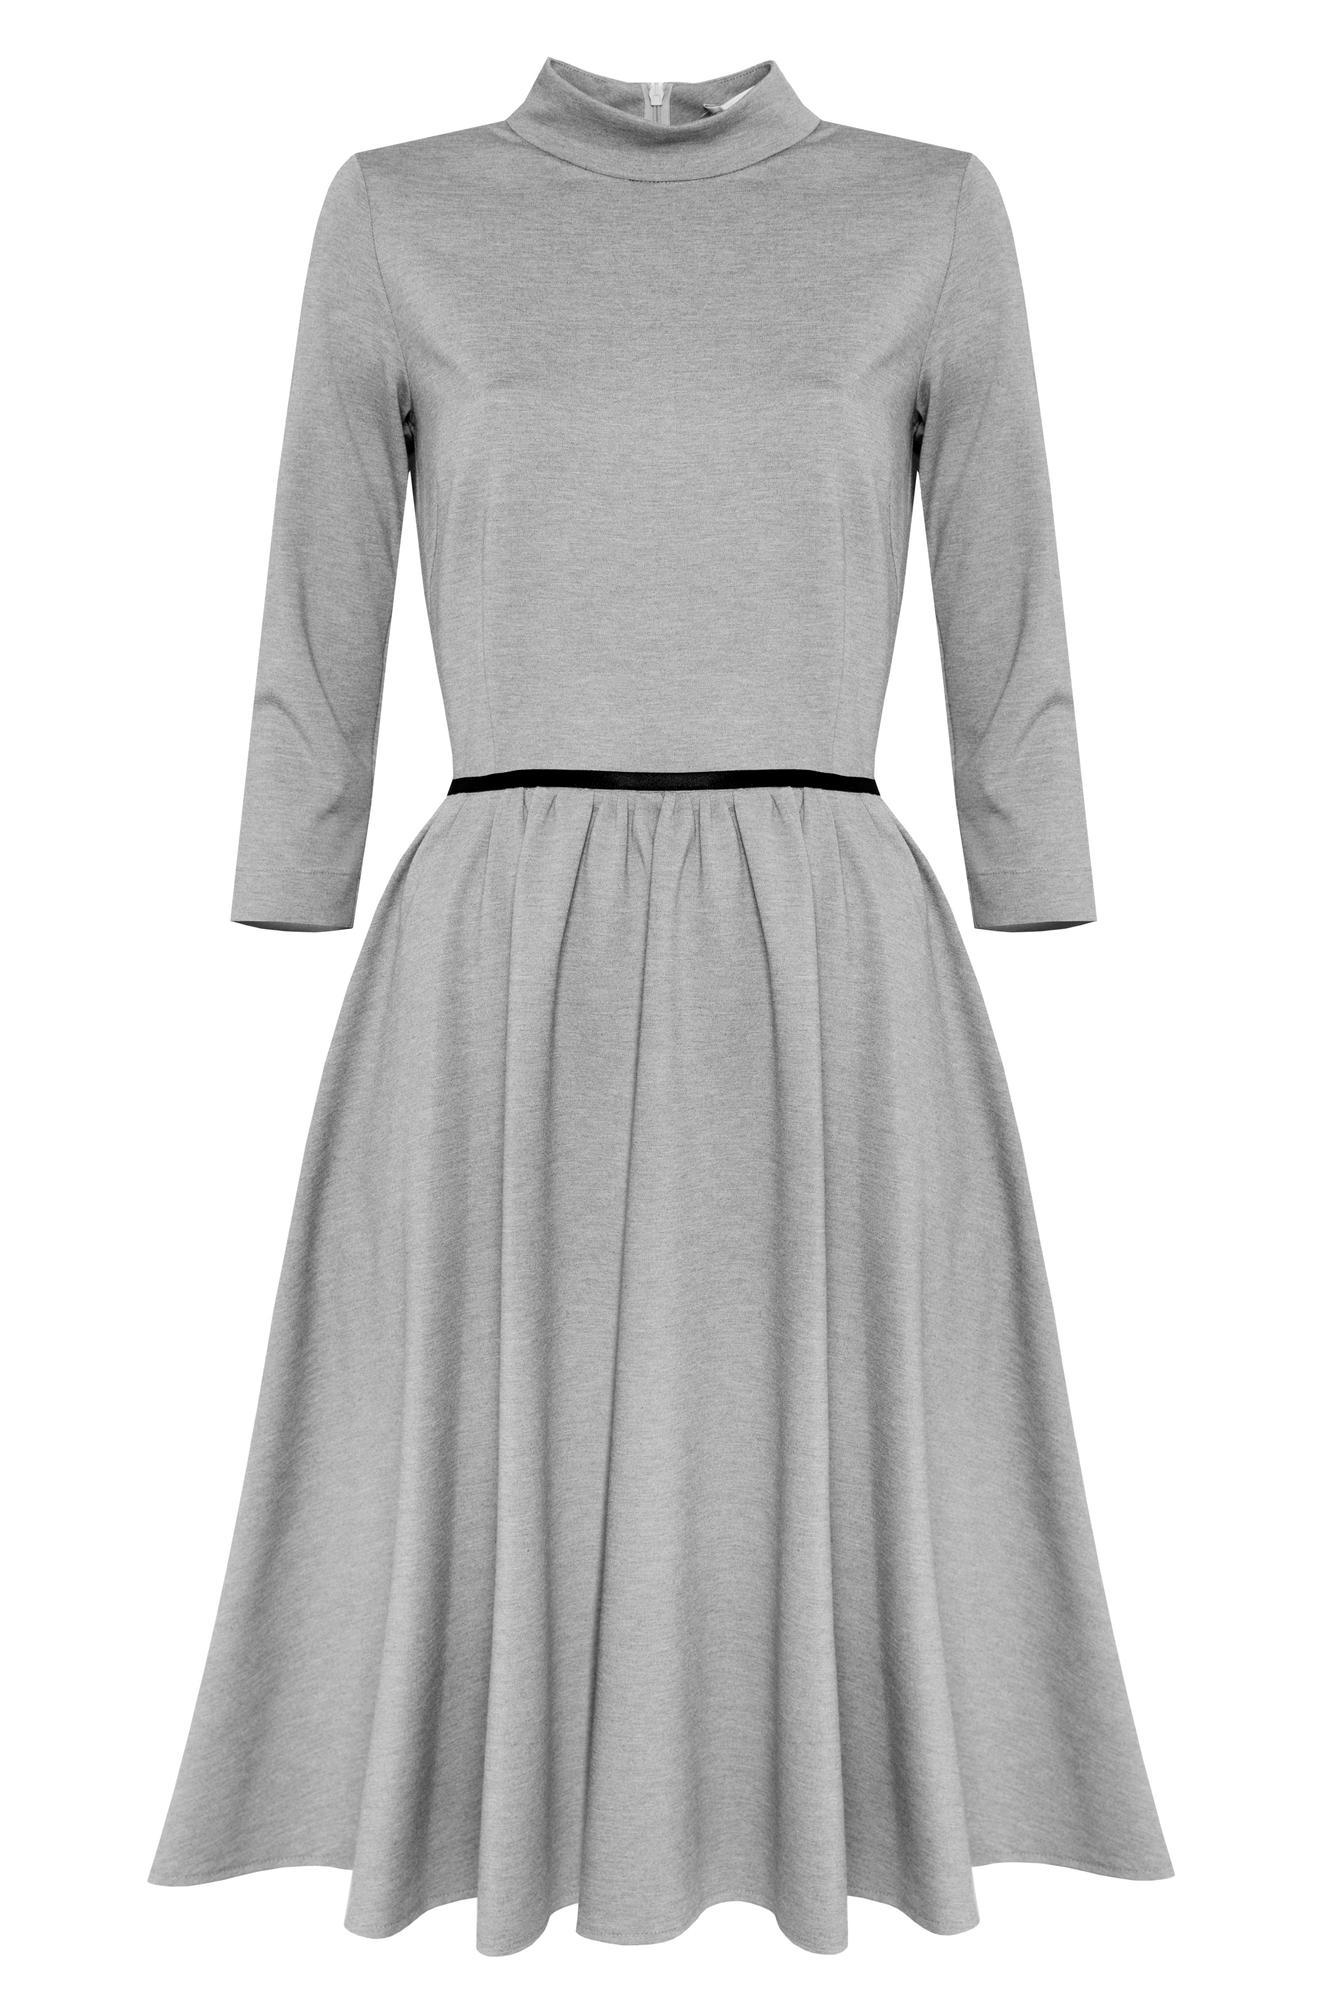 Popielata sukienka ze stójką PALOMA polski projektant - Kasia Miciak design